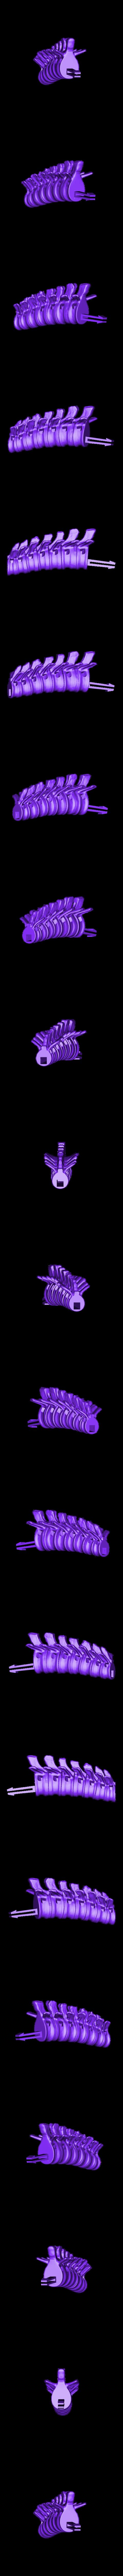 TRex_Dorsal_1.stl Download free STL file T-Rex Skeleton - Leo Burton Mount • 3D printing design, HarryHistory